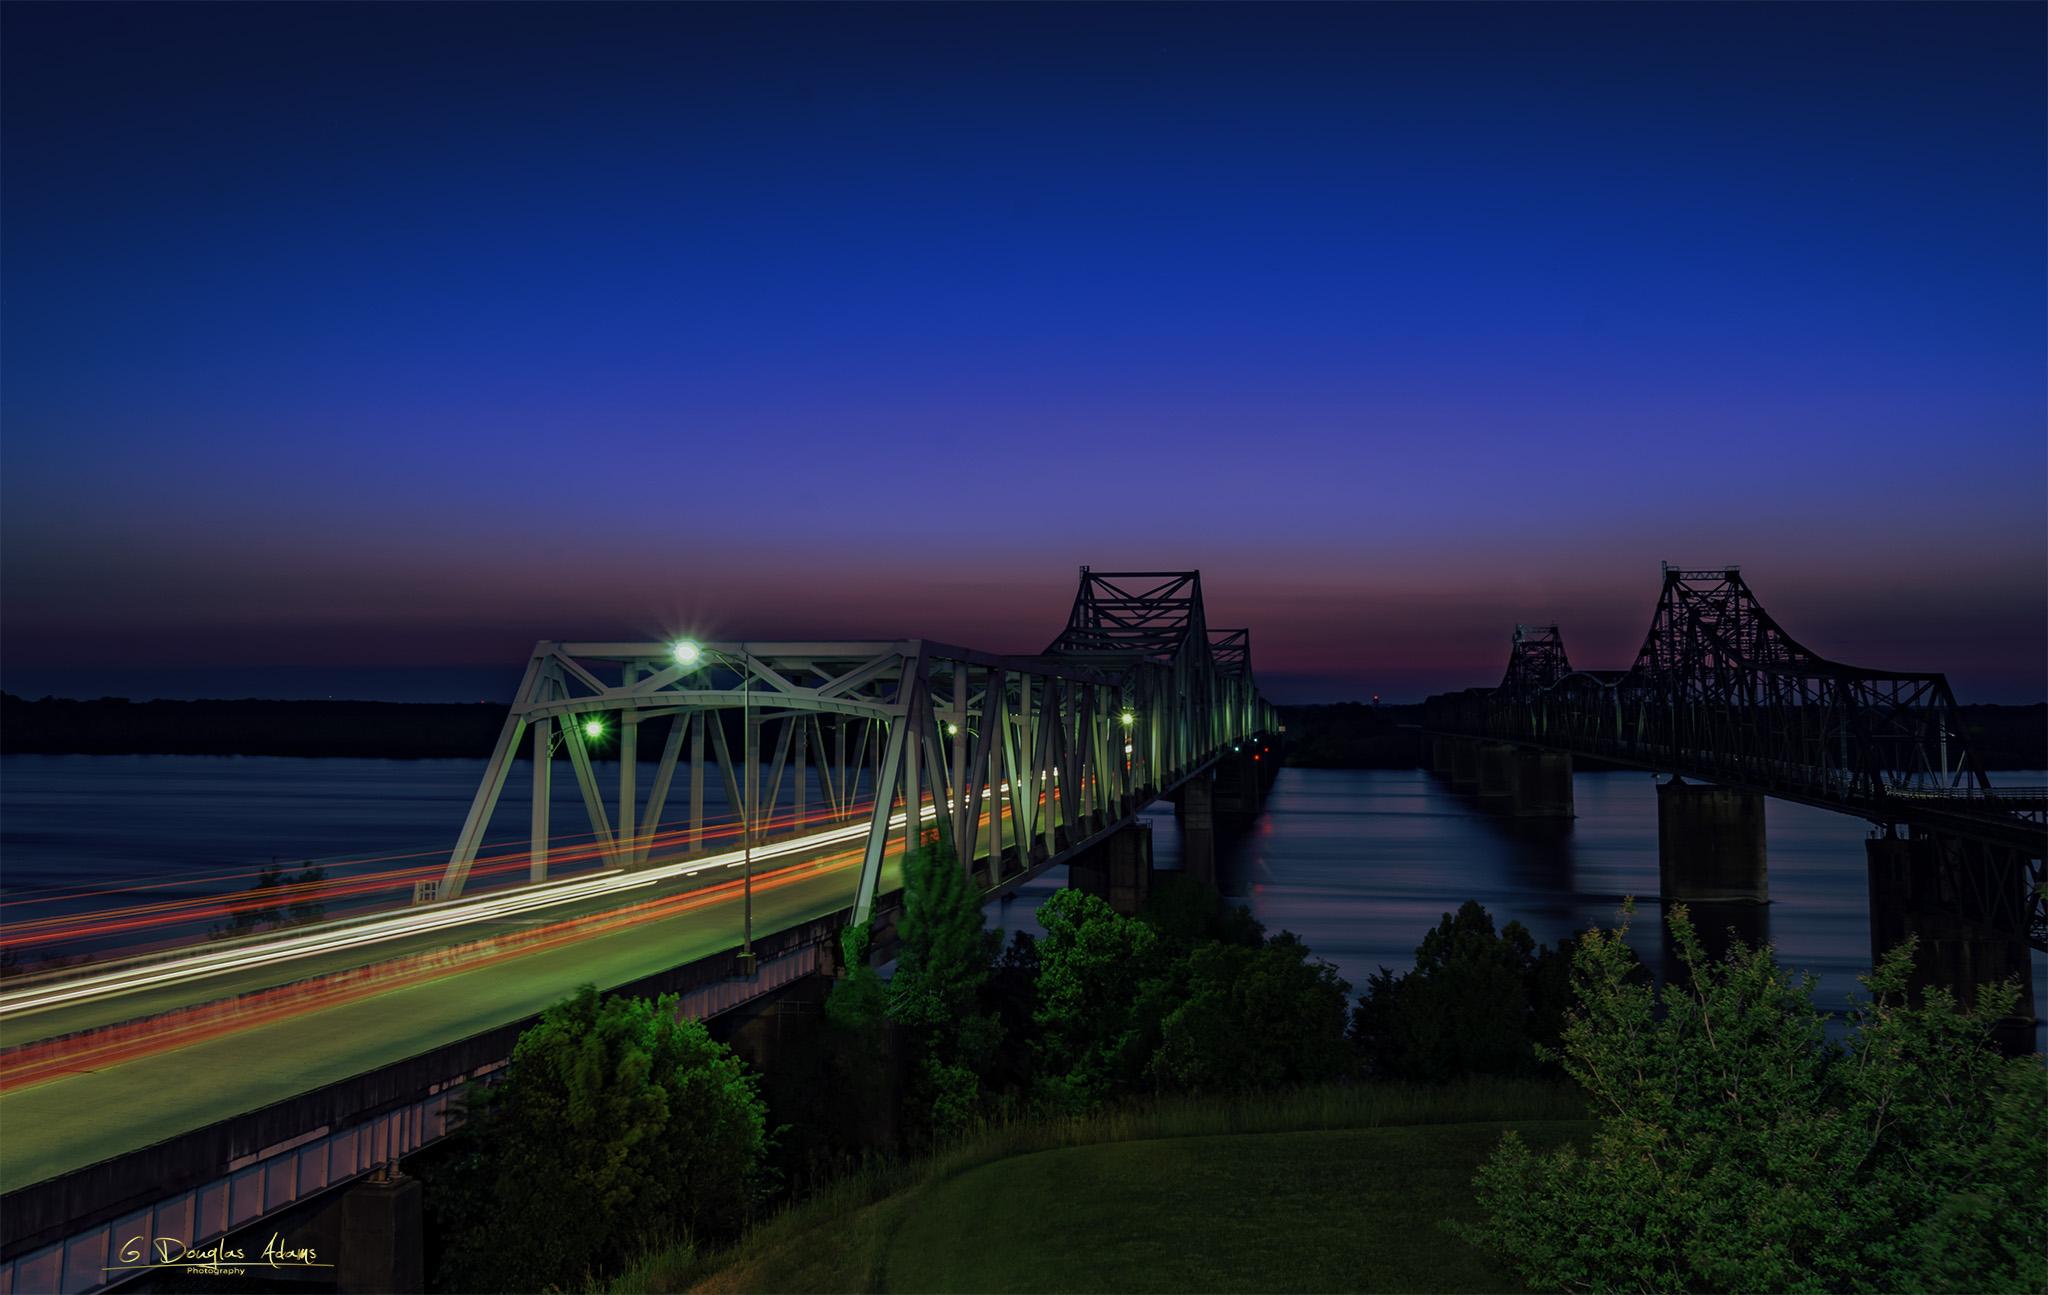 VicksburgBridge